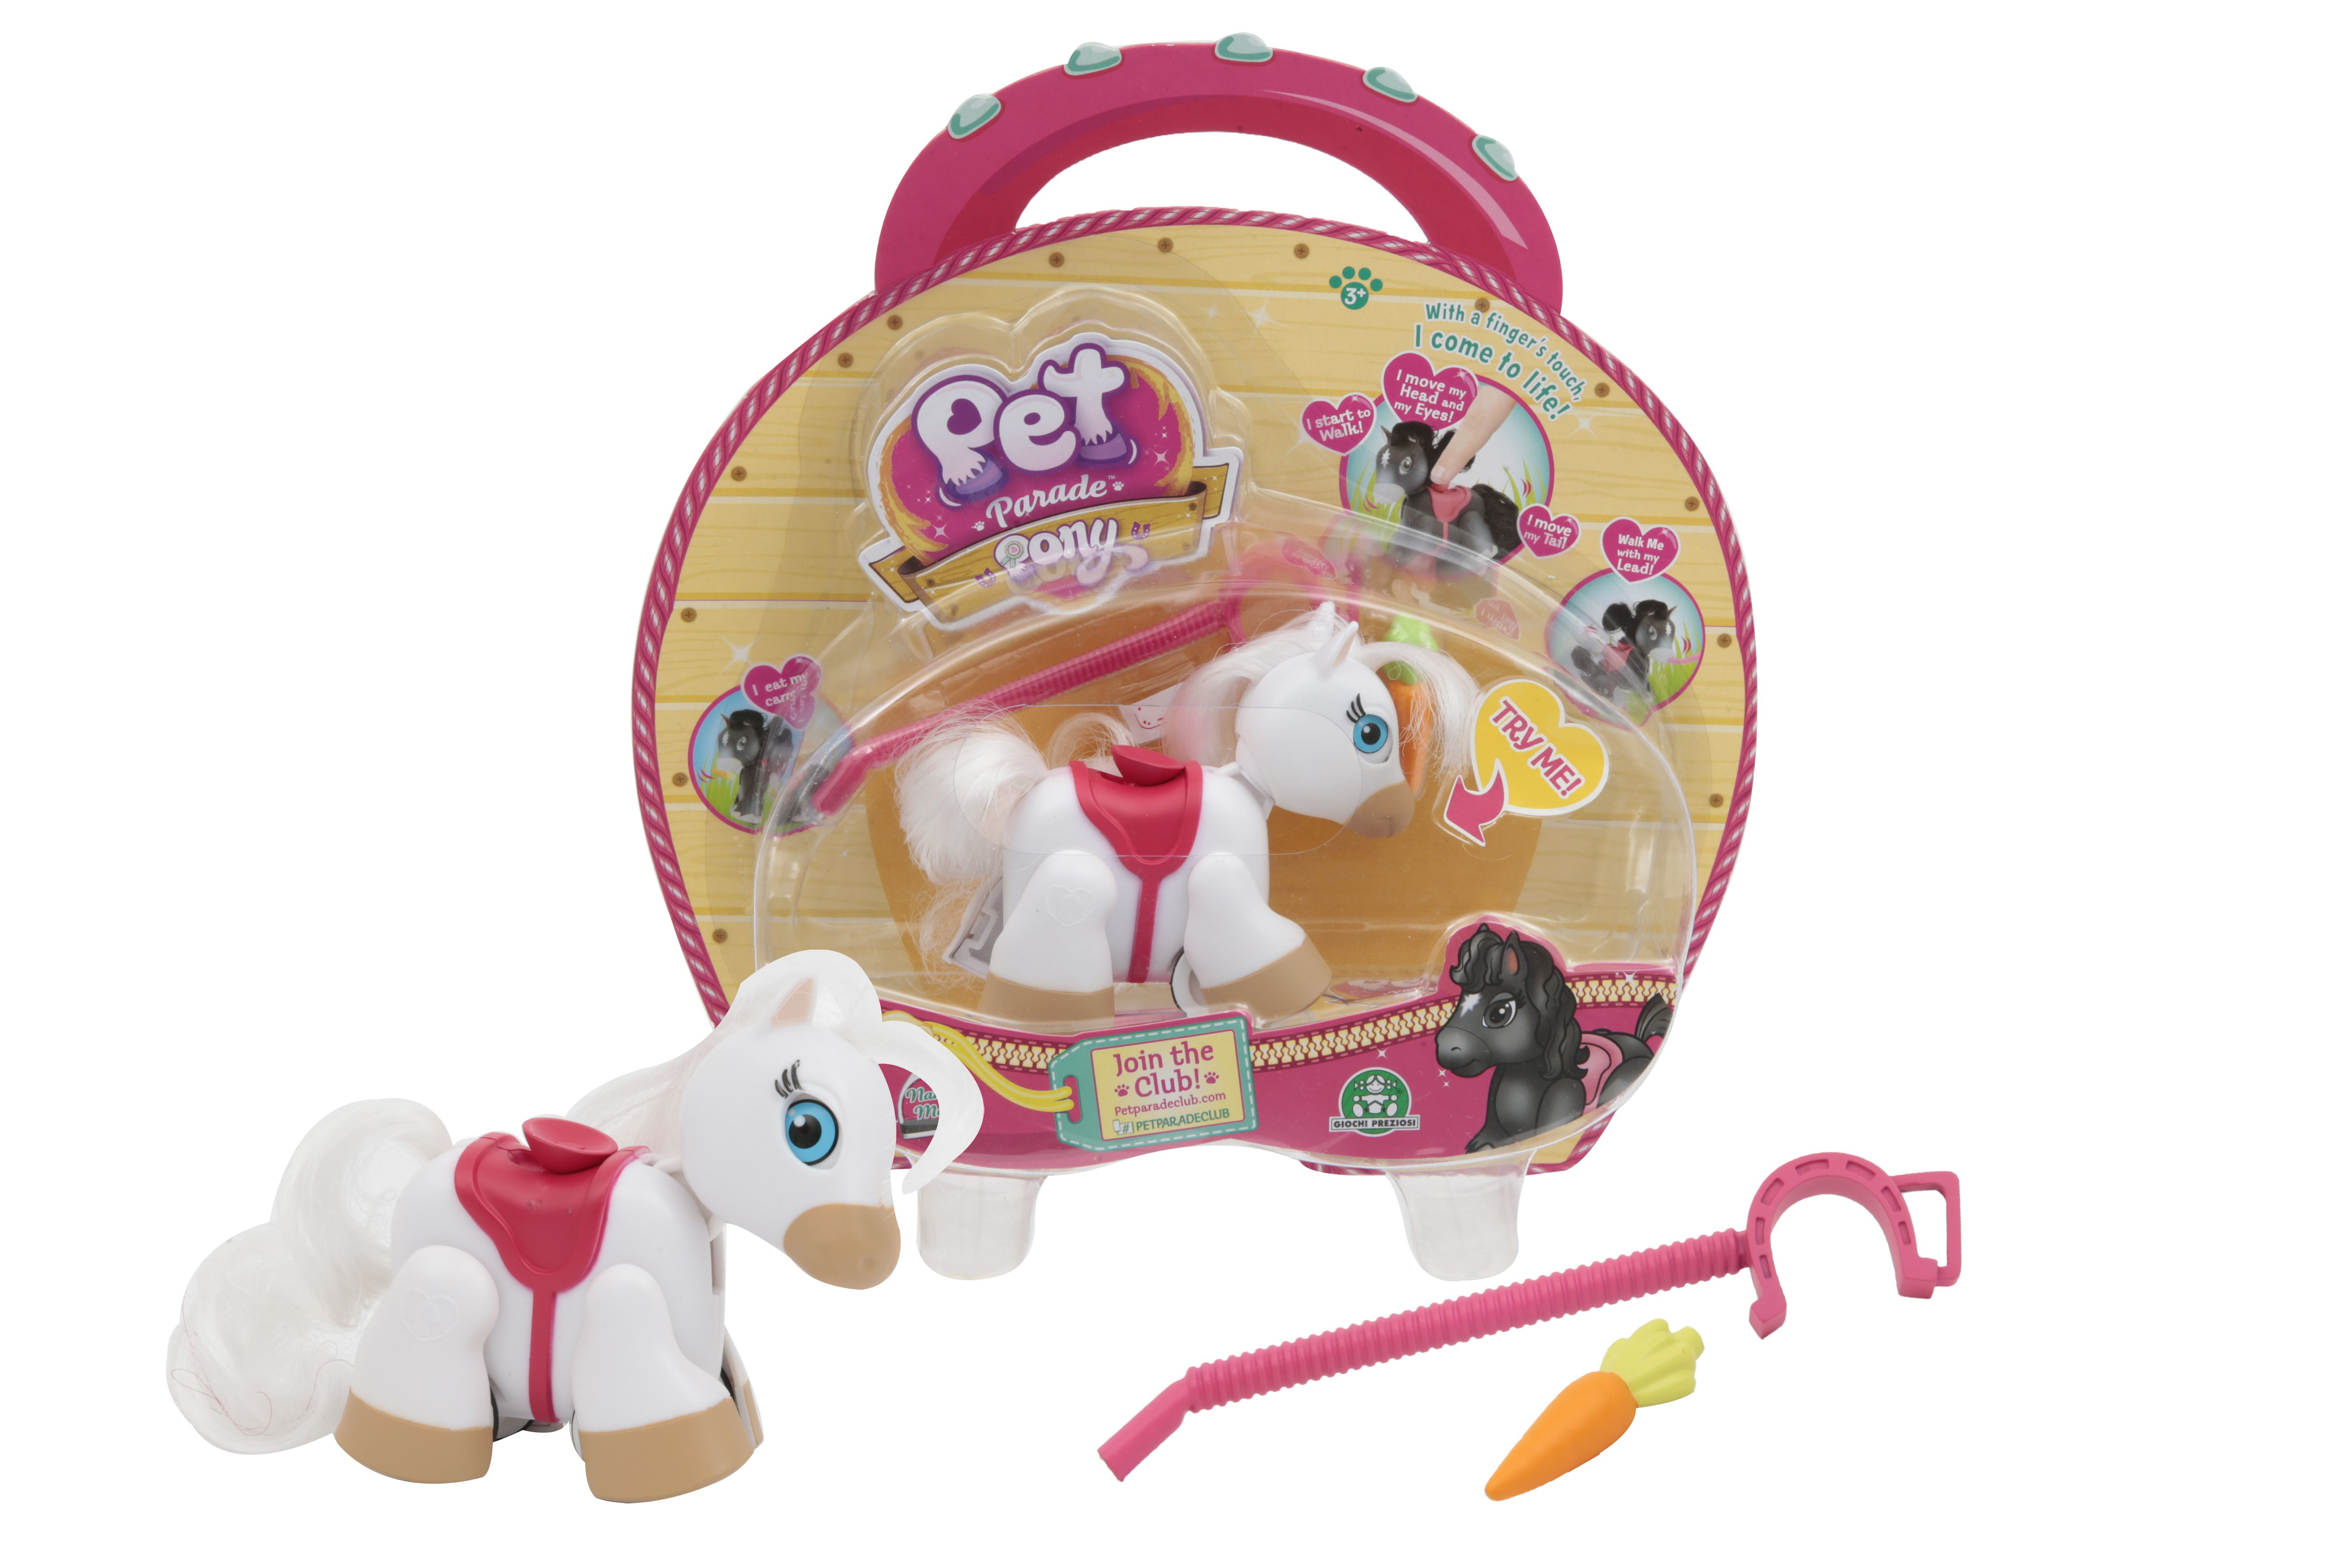 Giochi Preziosi Pony Parade Blister Singolo